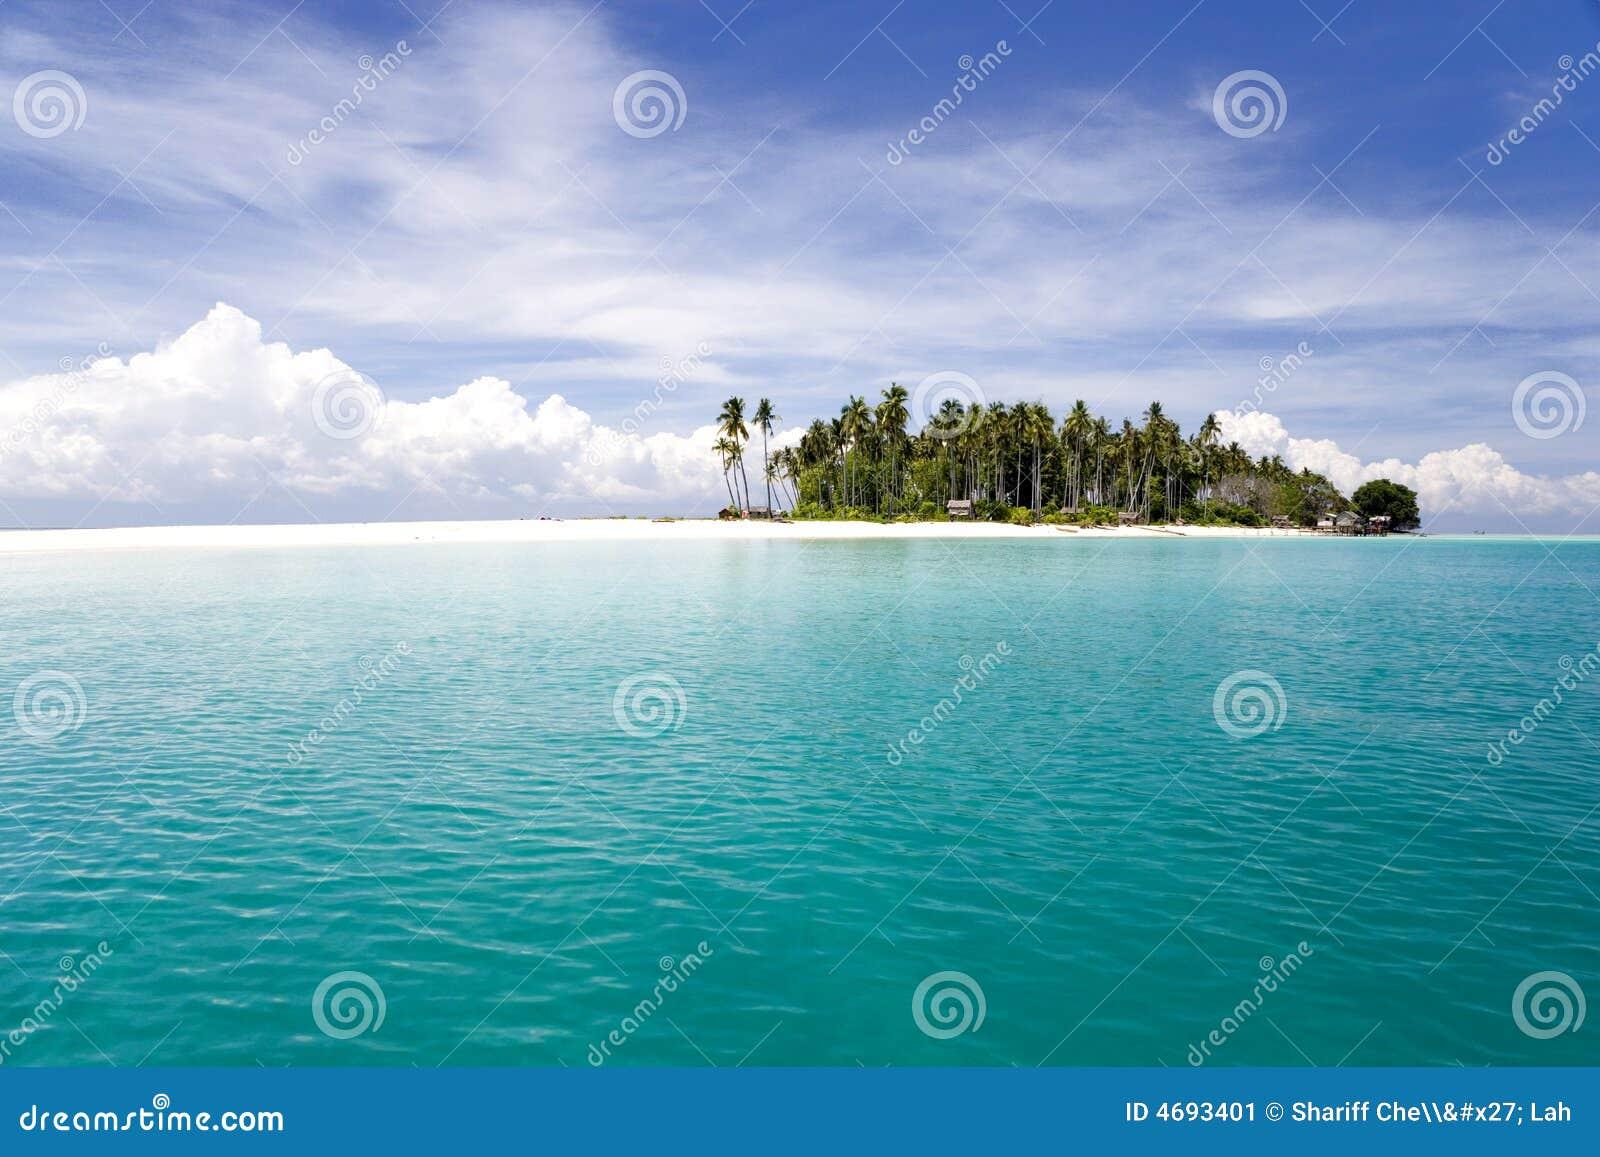 Tropical Island and Sea